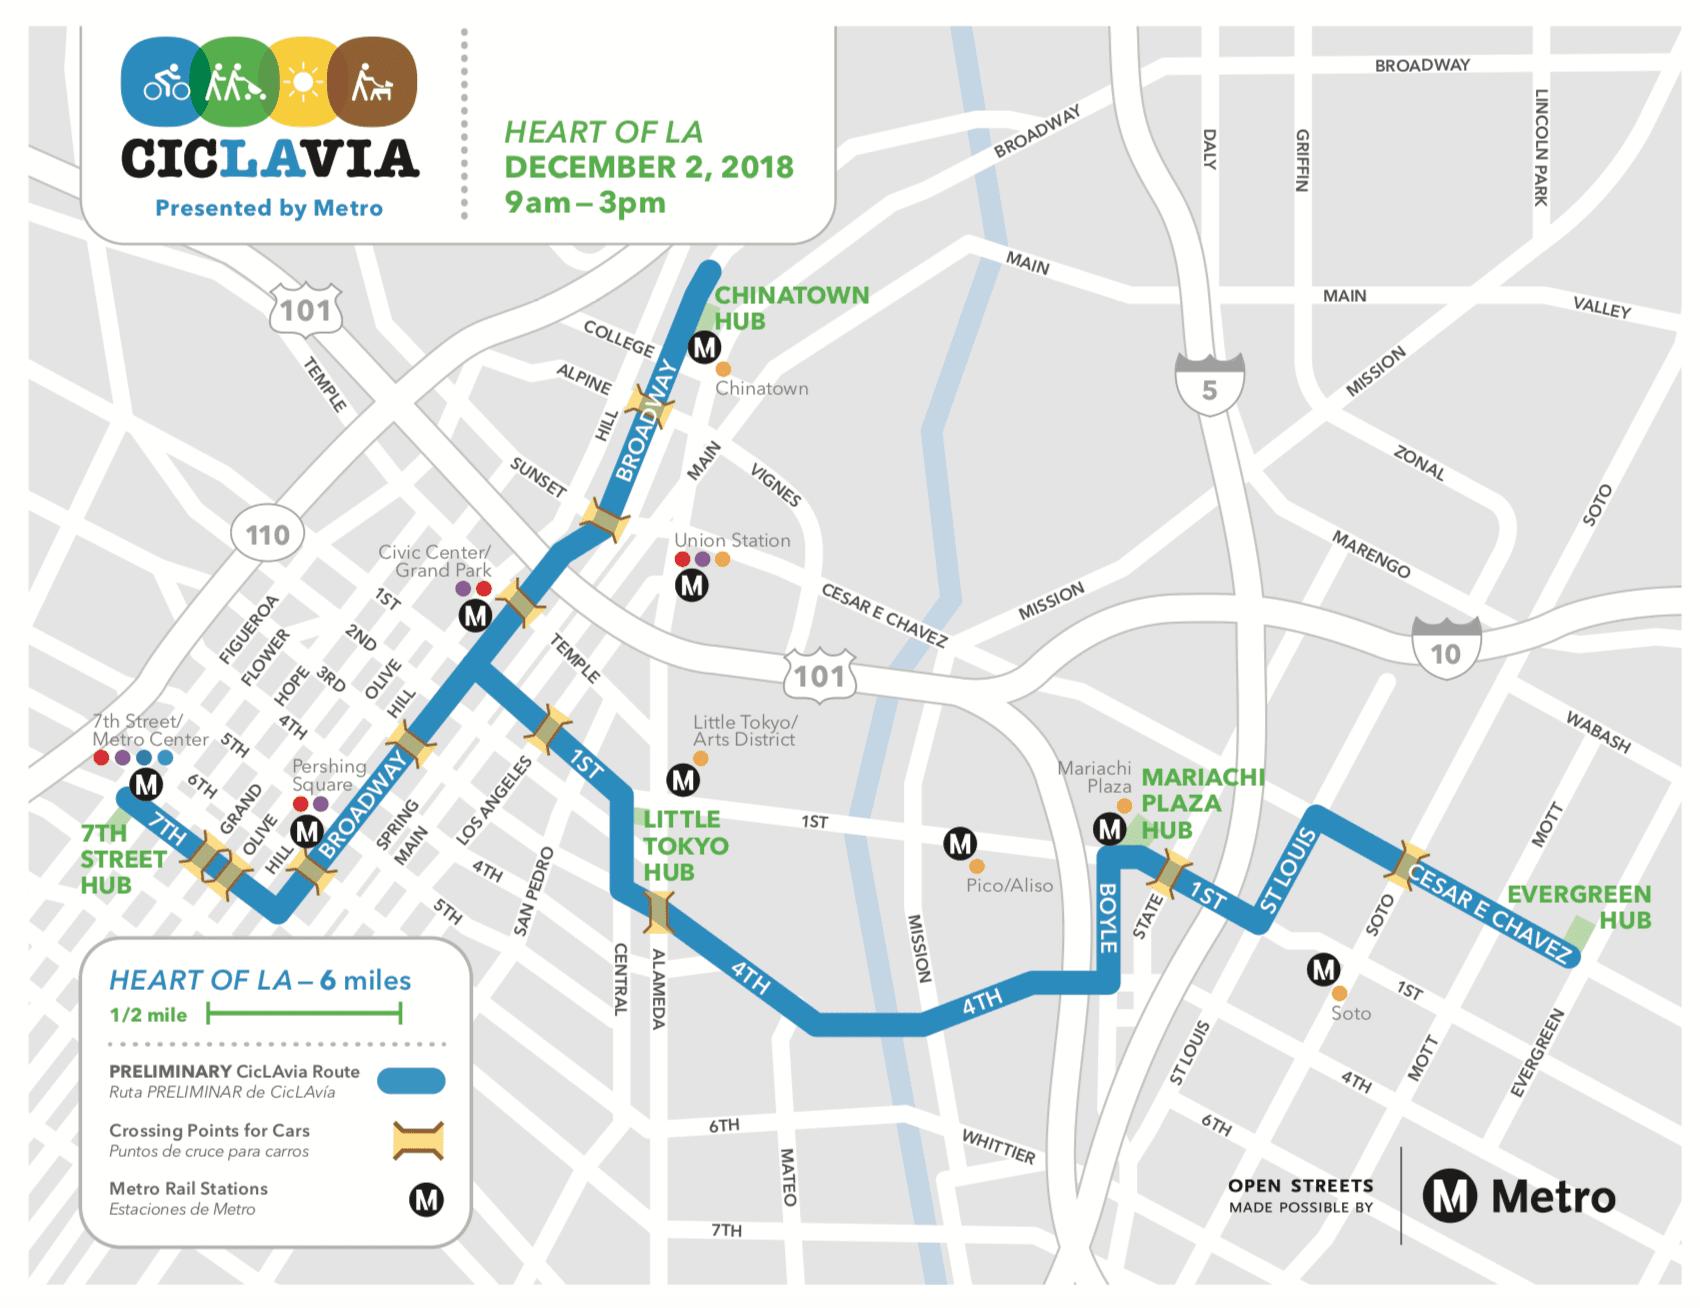 La Metro Map 2018.Go Metro To Ciclavia Heart Of La On Sunday Dec 2 The Source